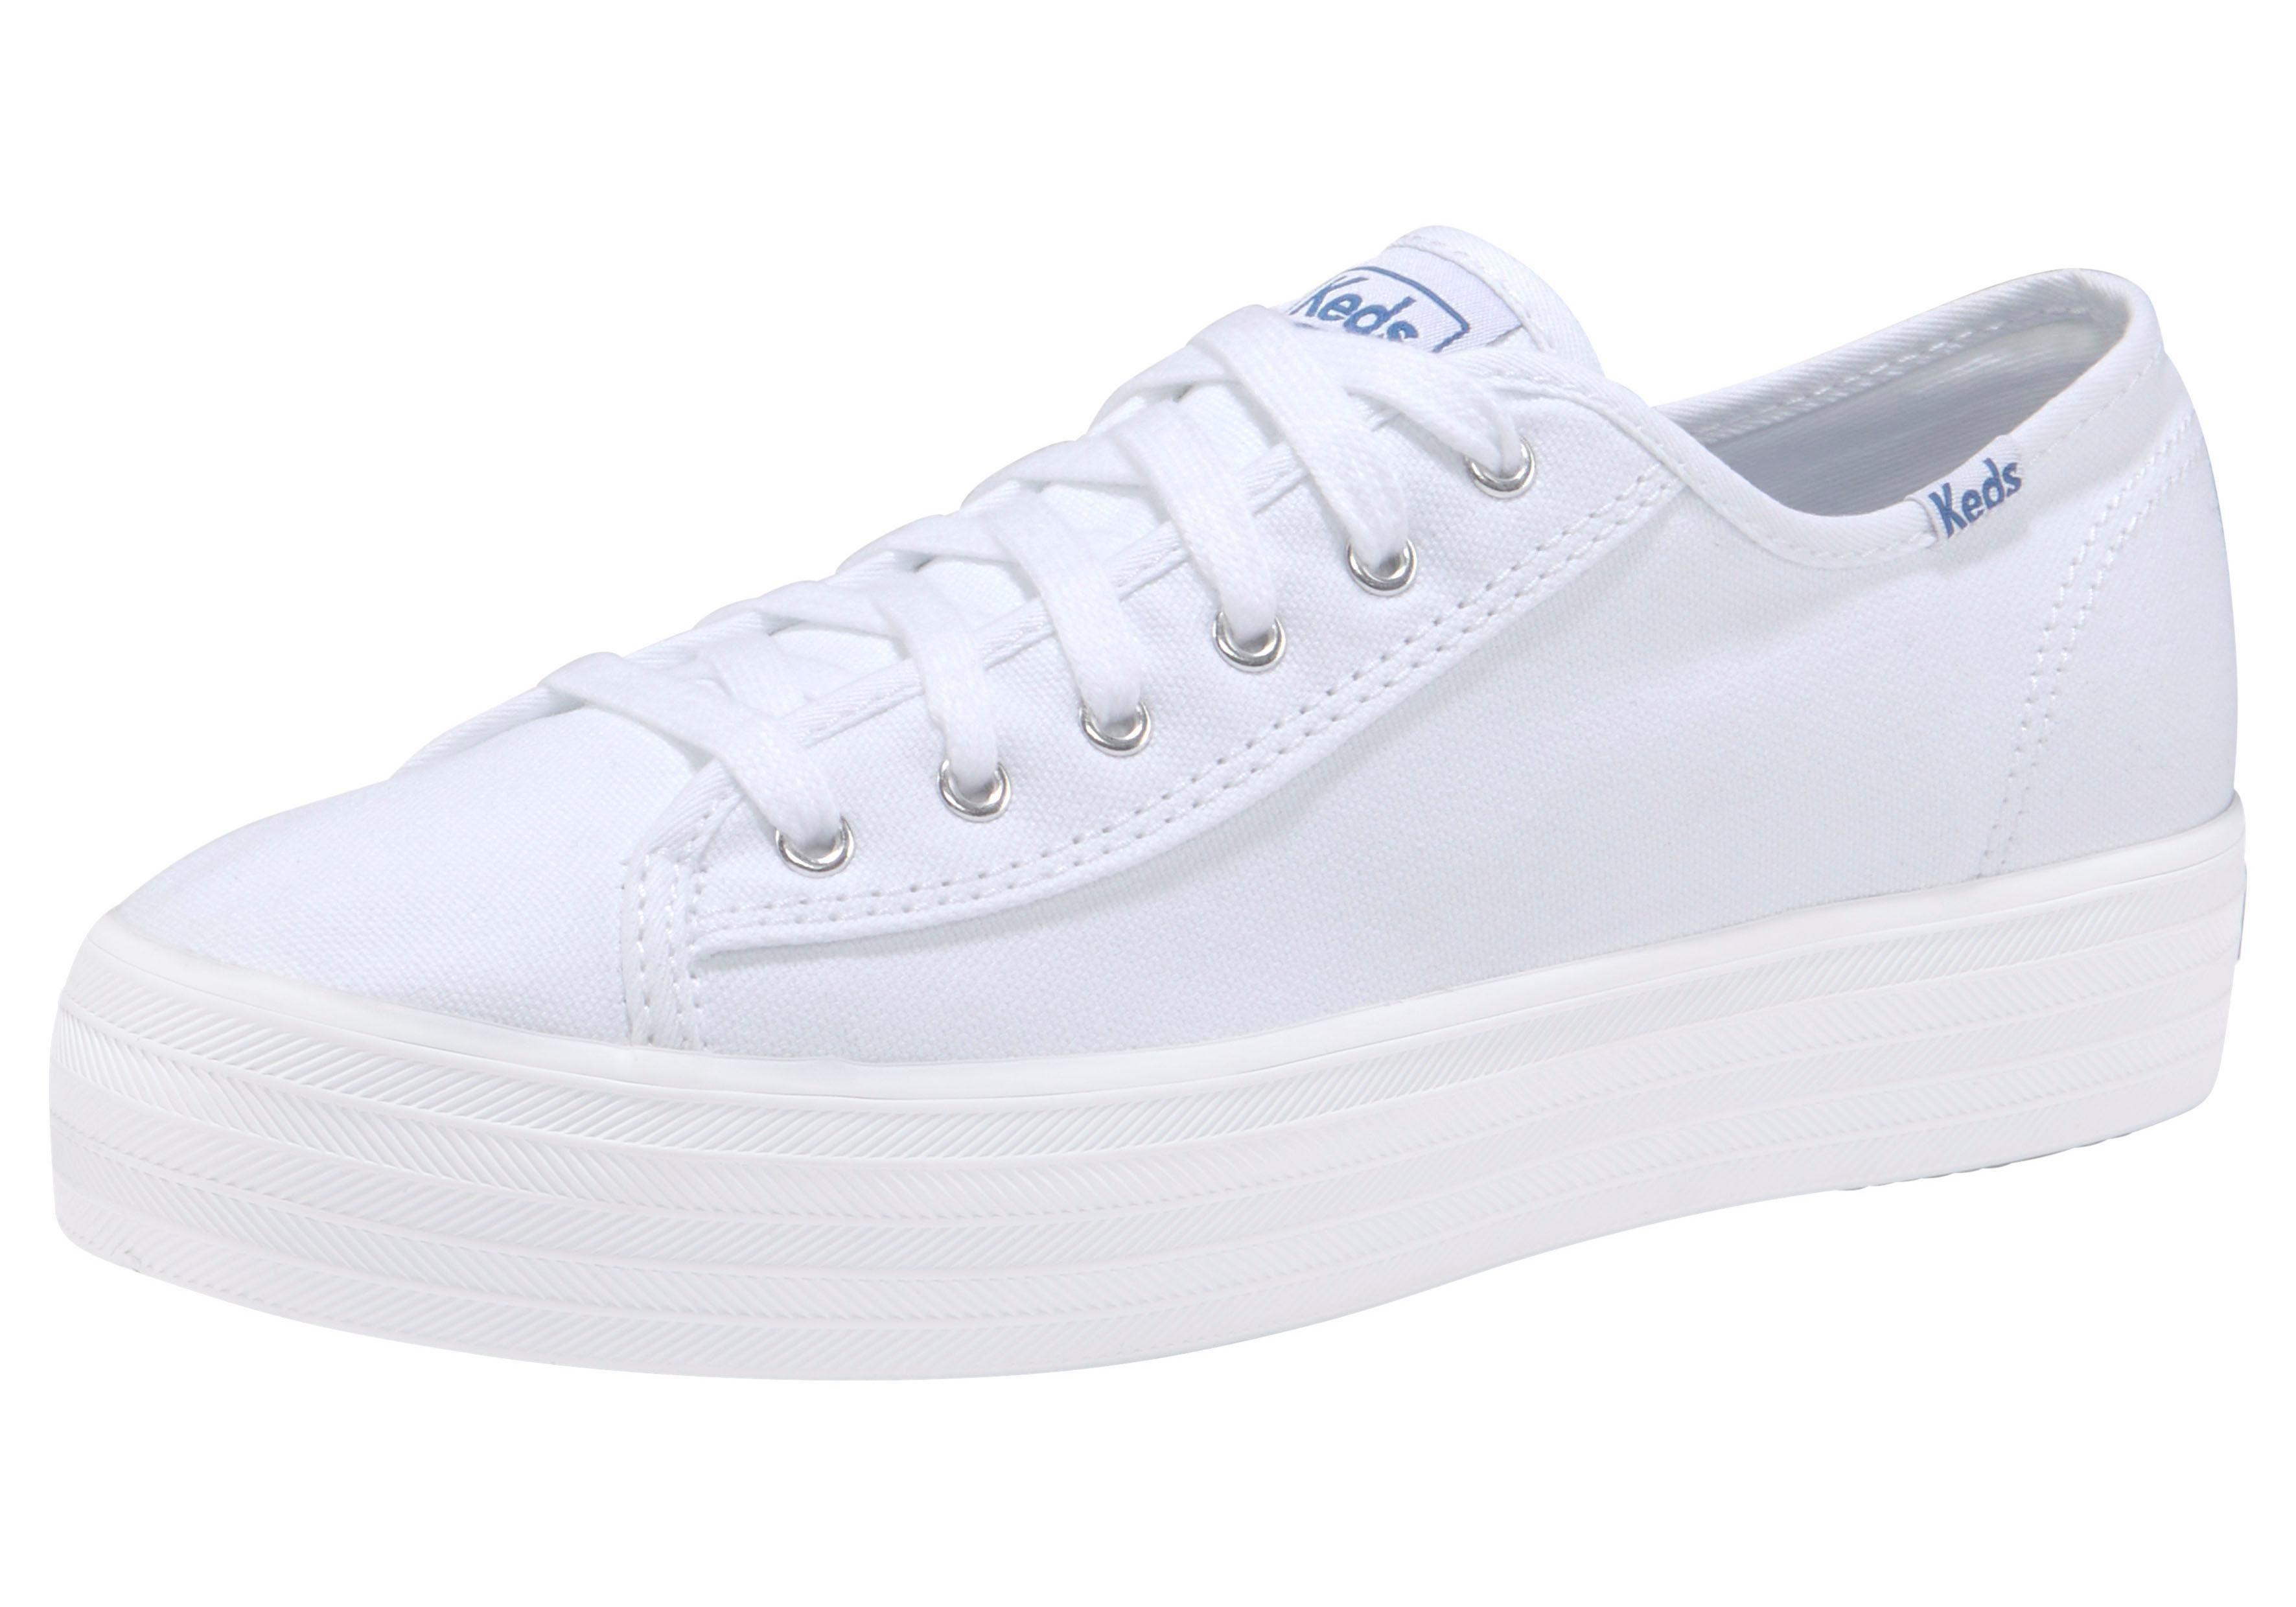 Keds Triple Kick Canvas Sneaker online kaufen  weiß